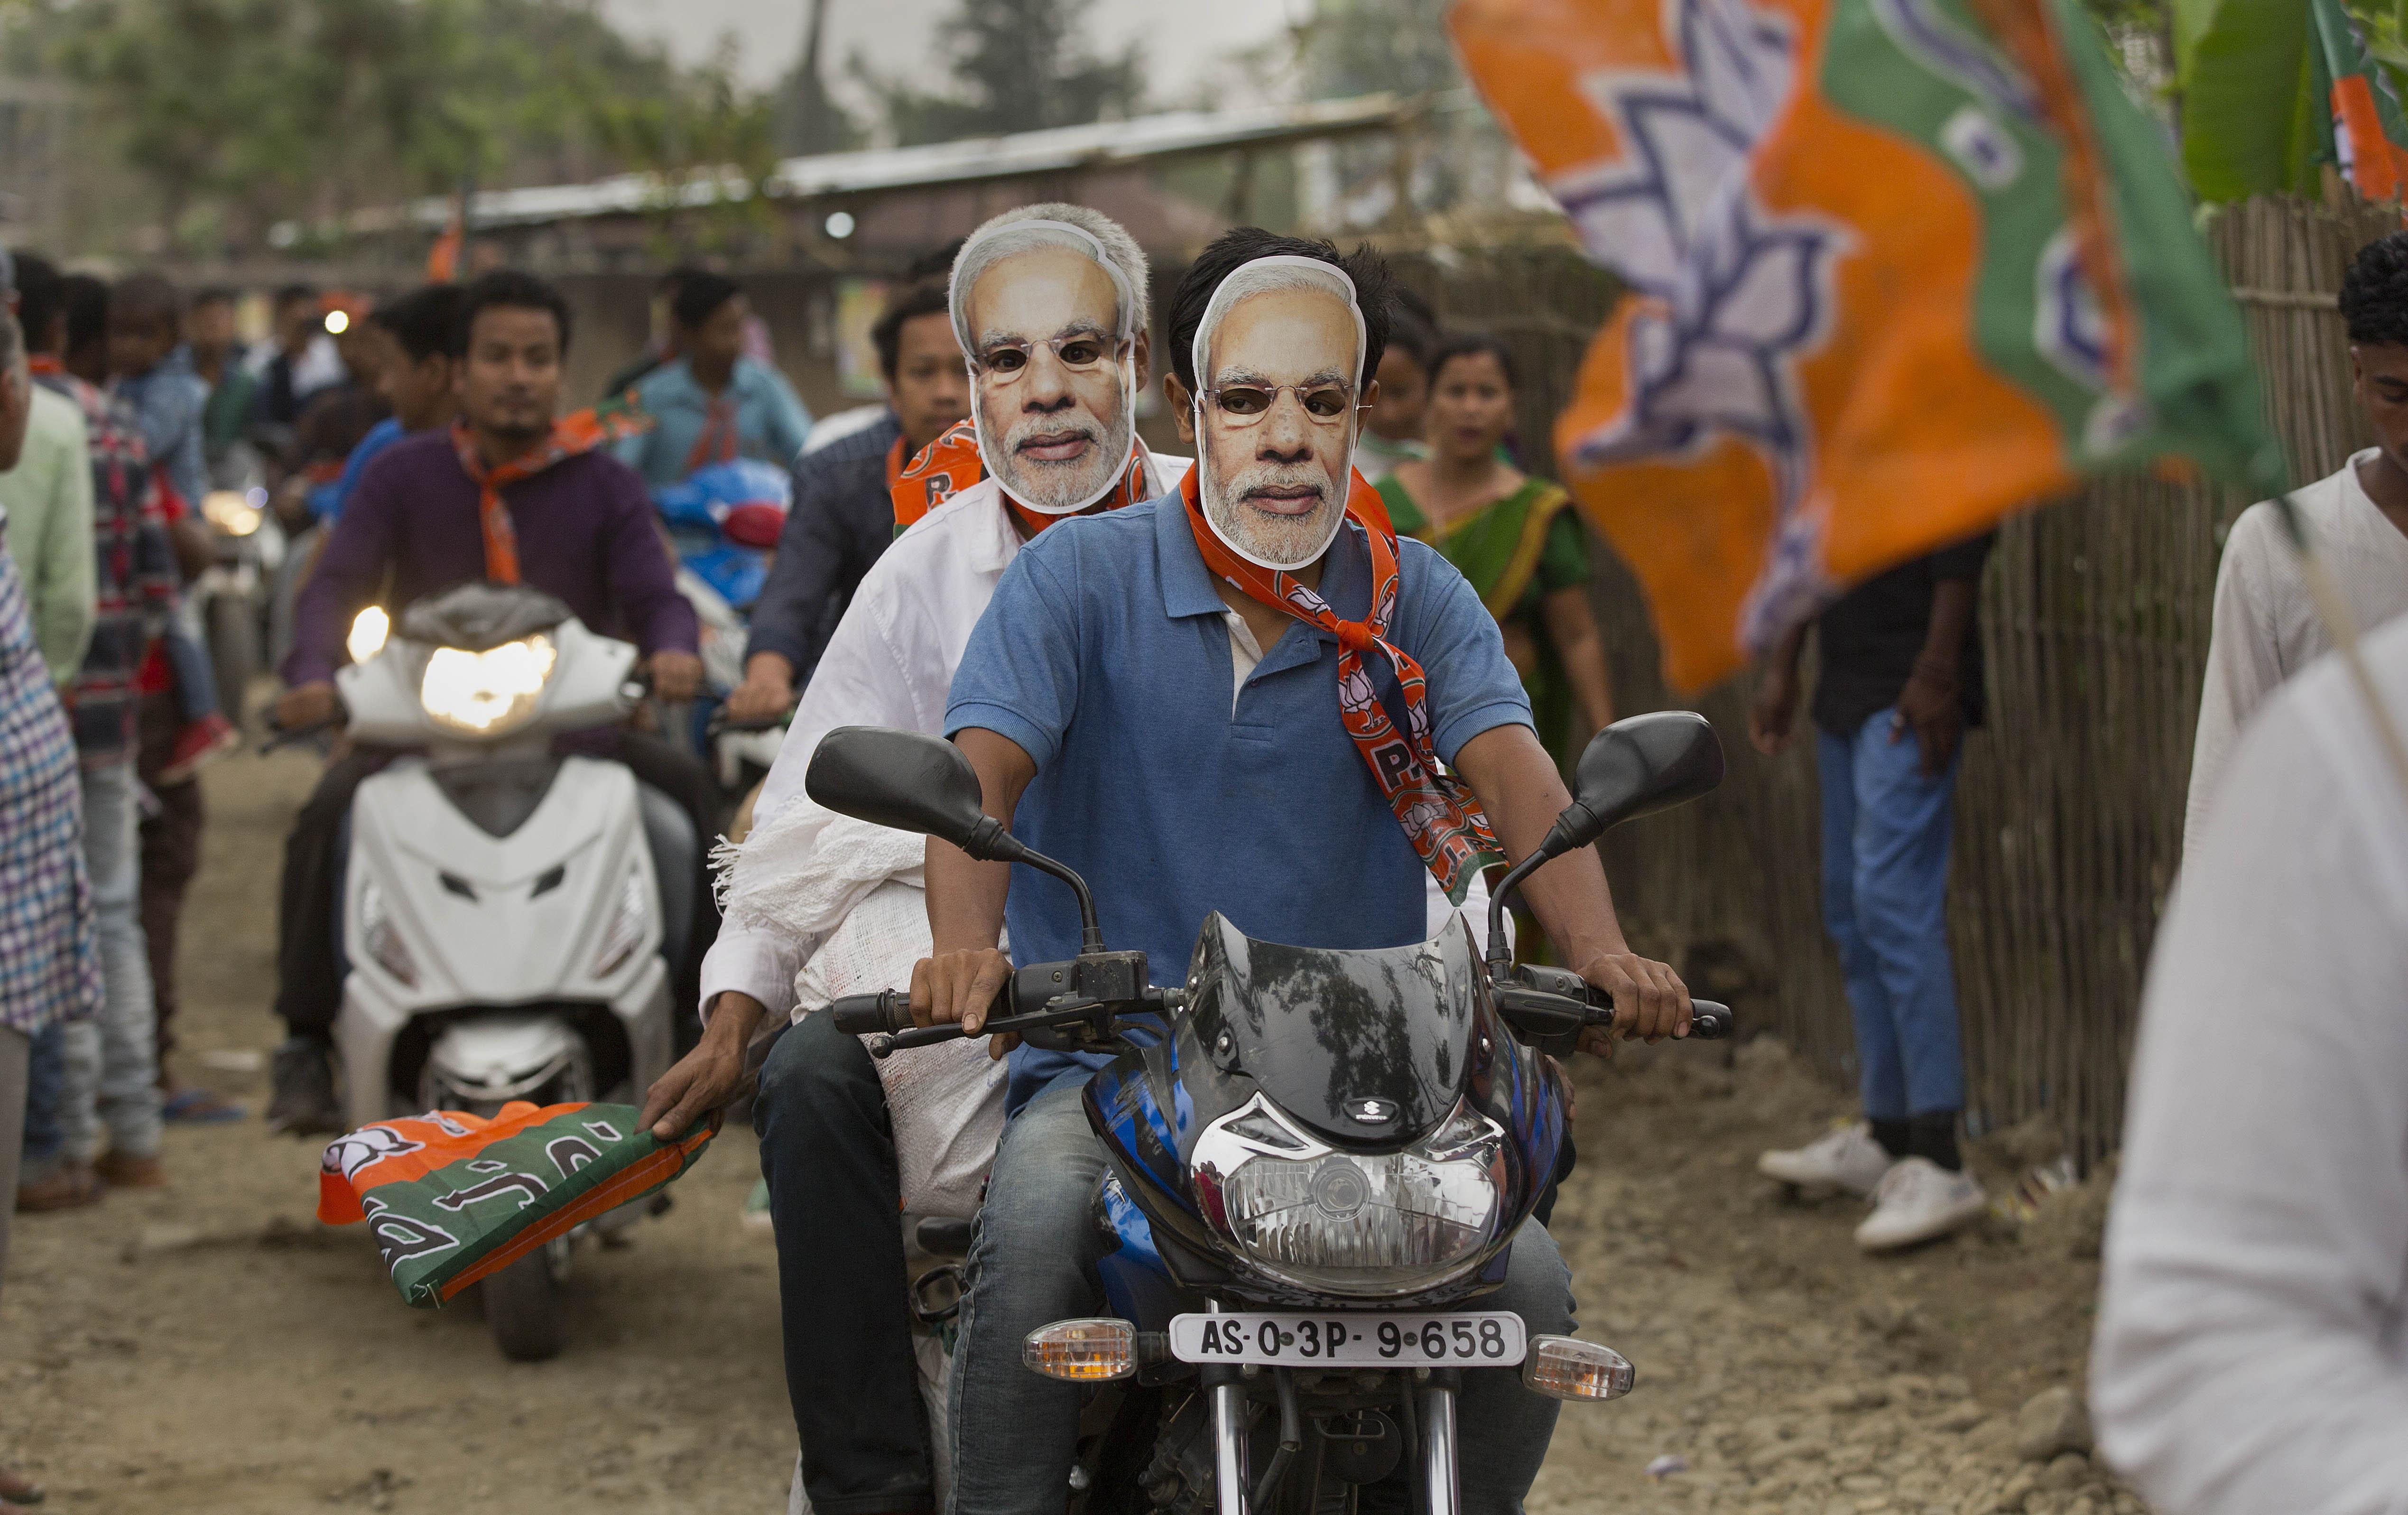 Final round of voting underway in India's marathon elections